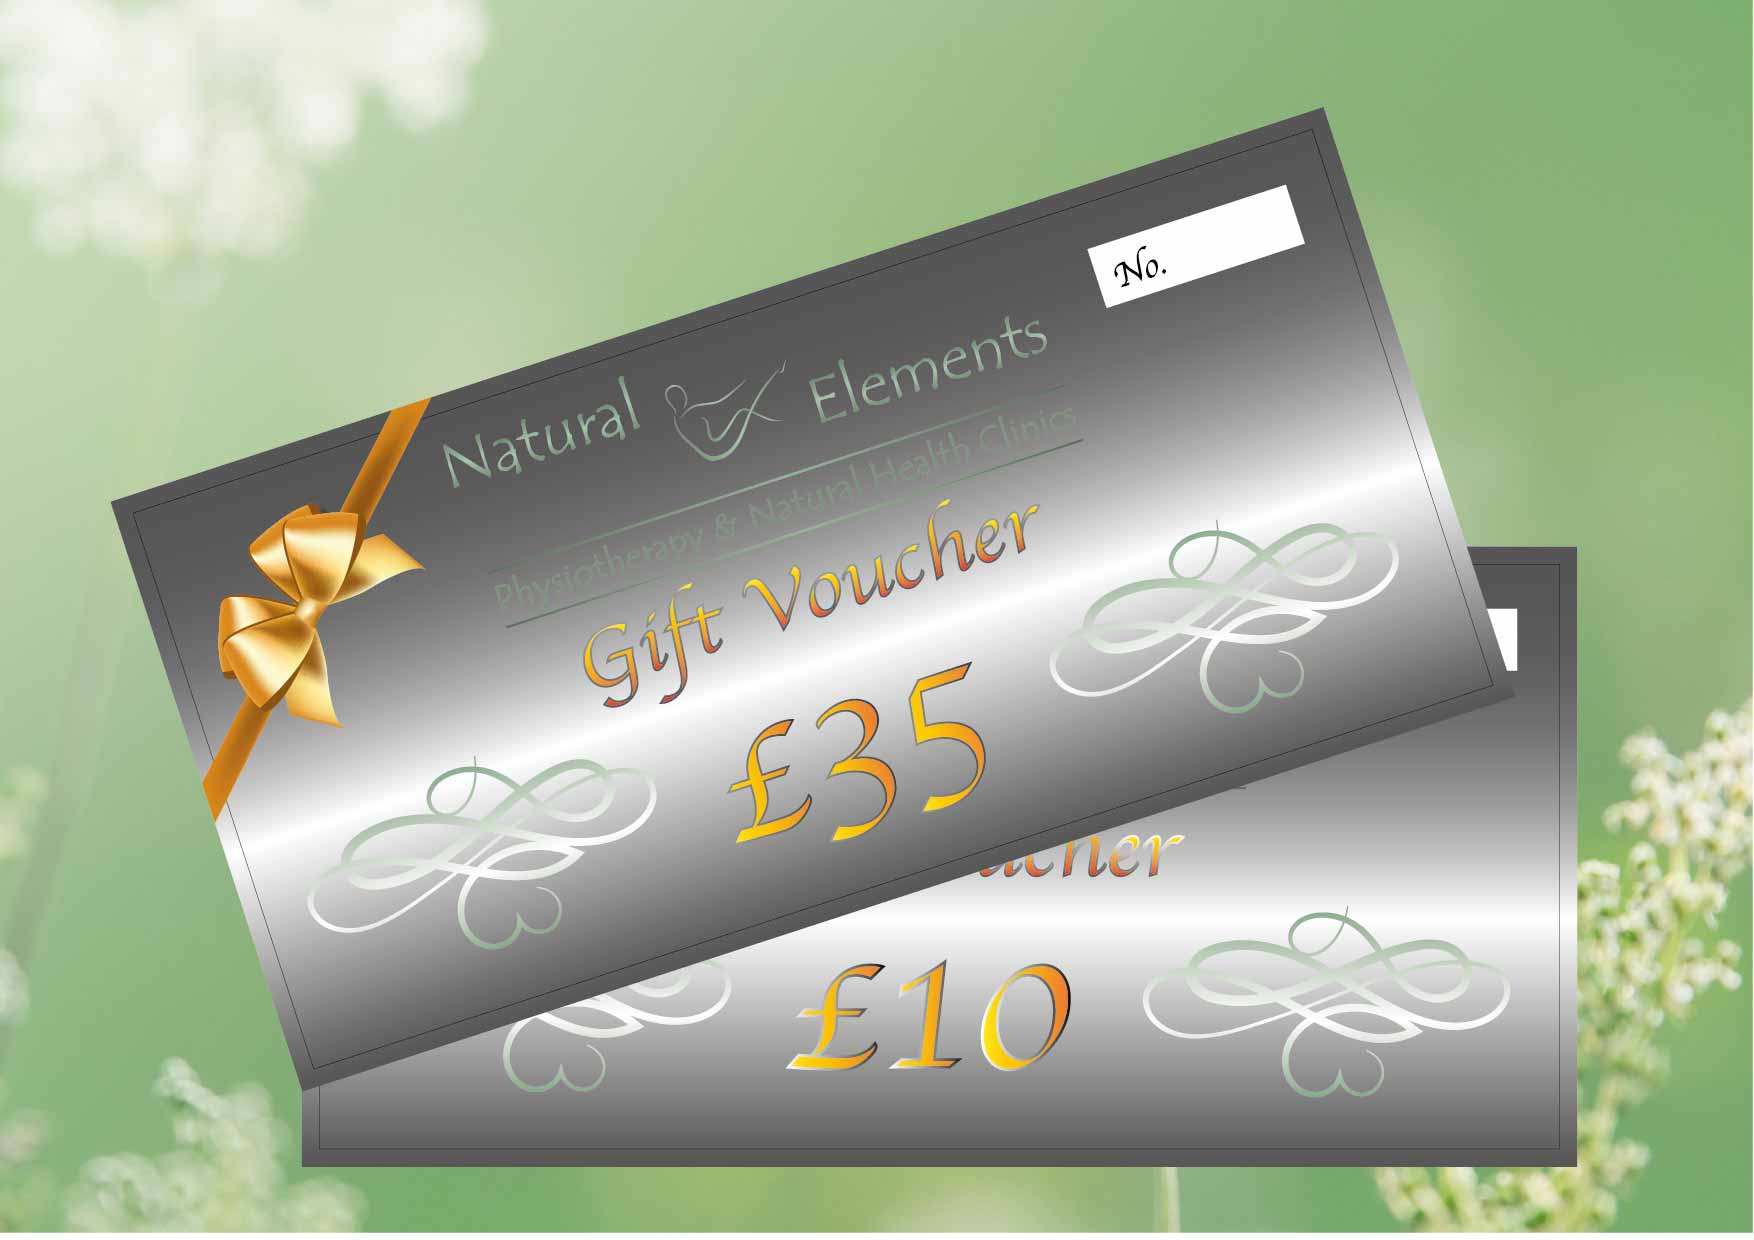 £35 Gift Vouchers